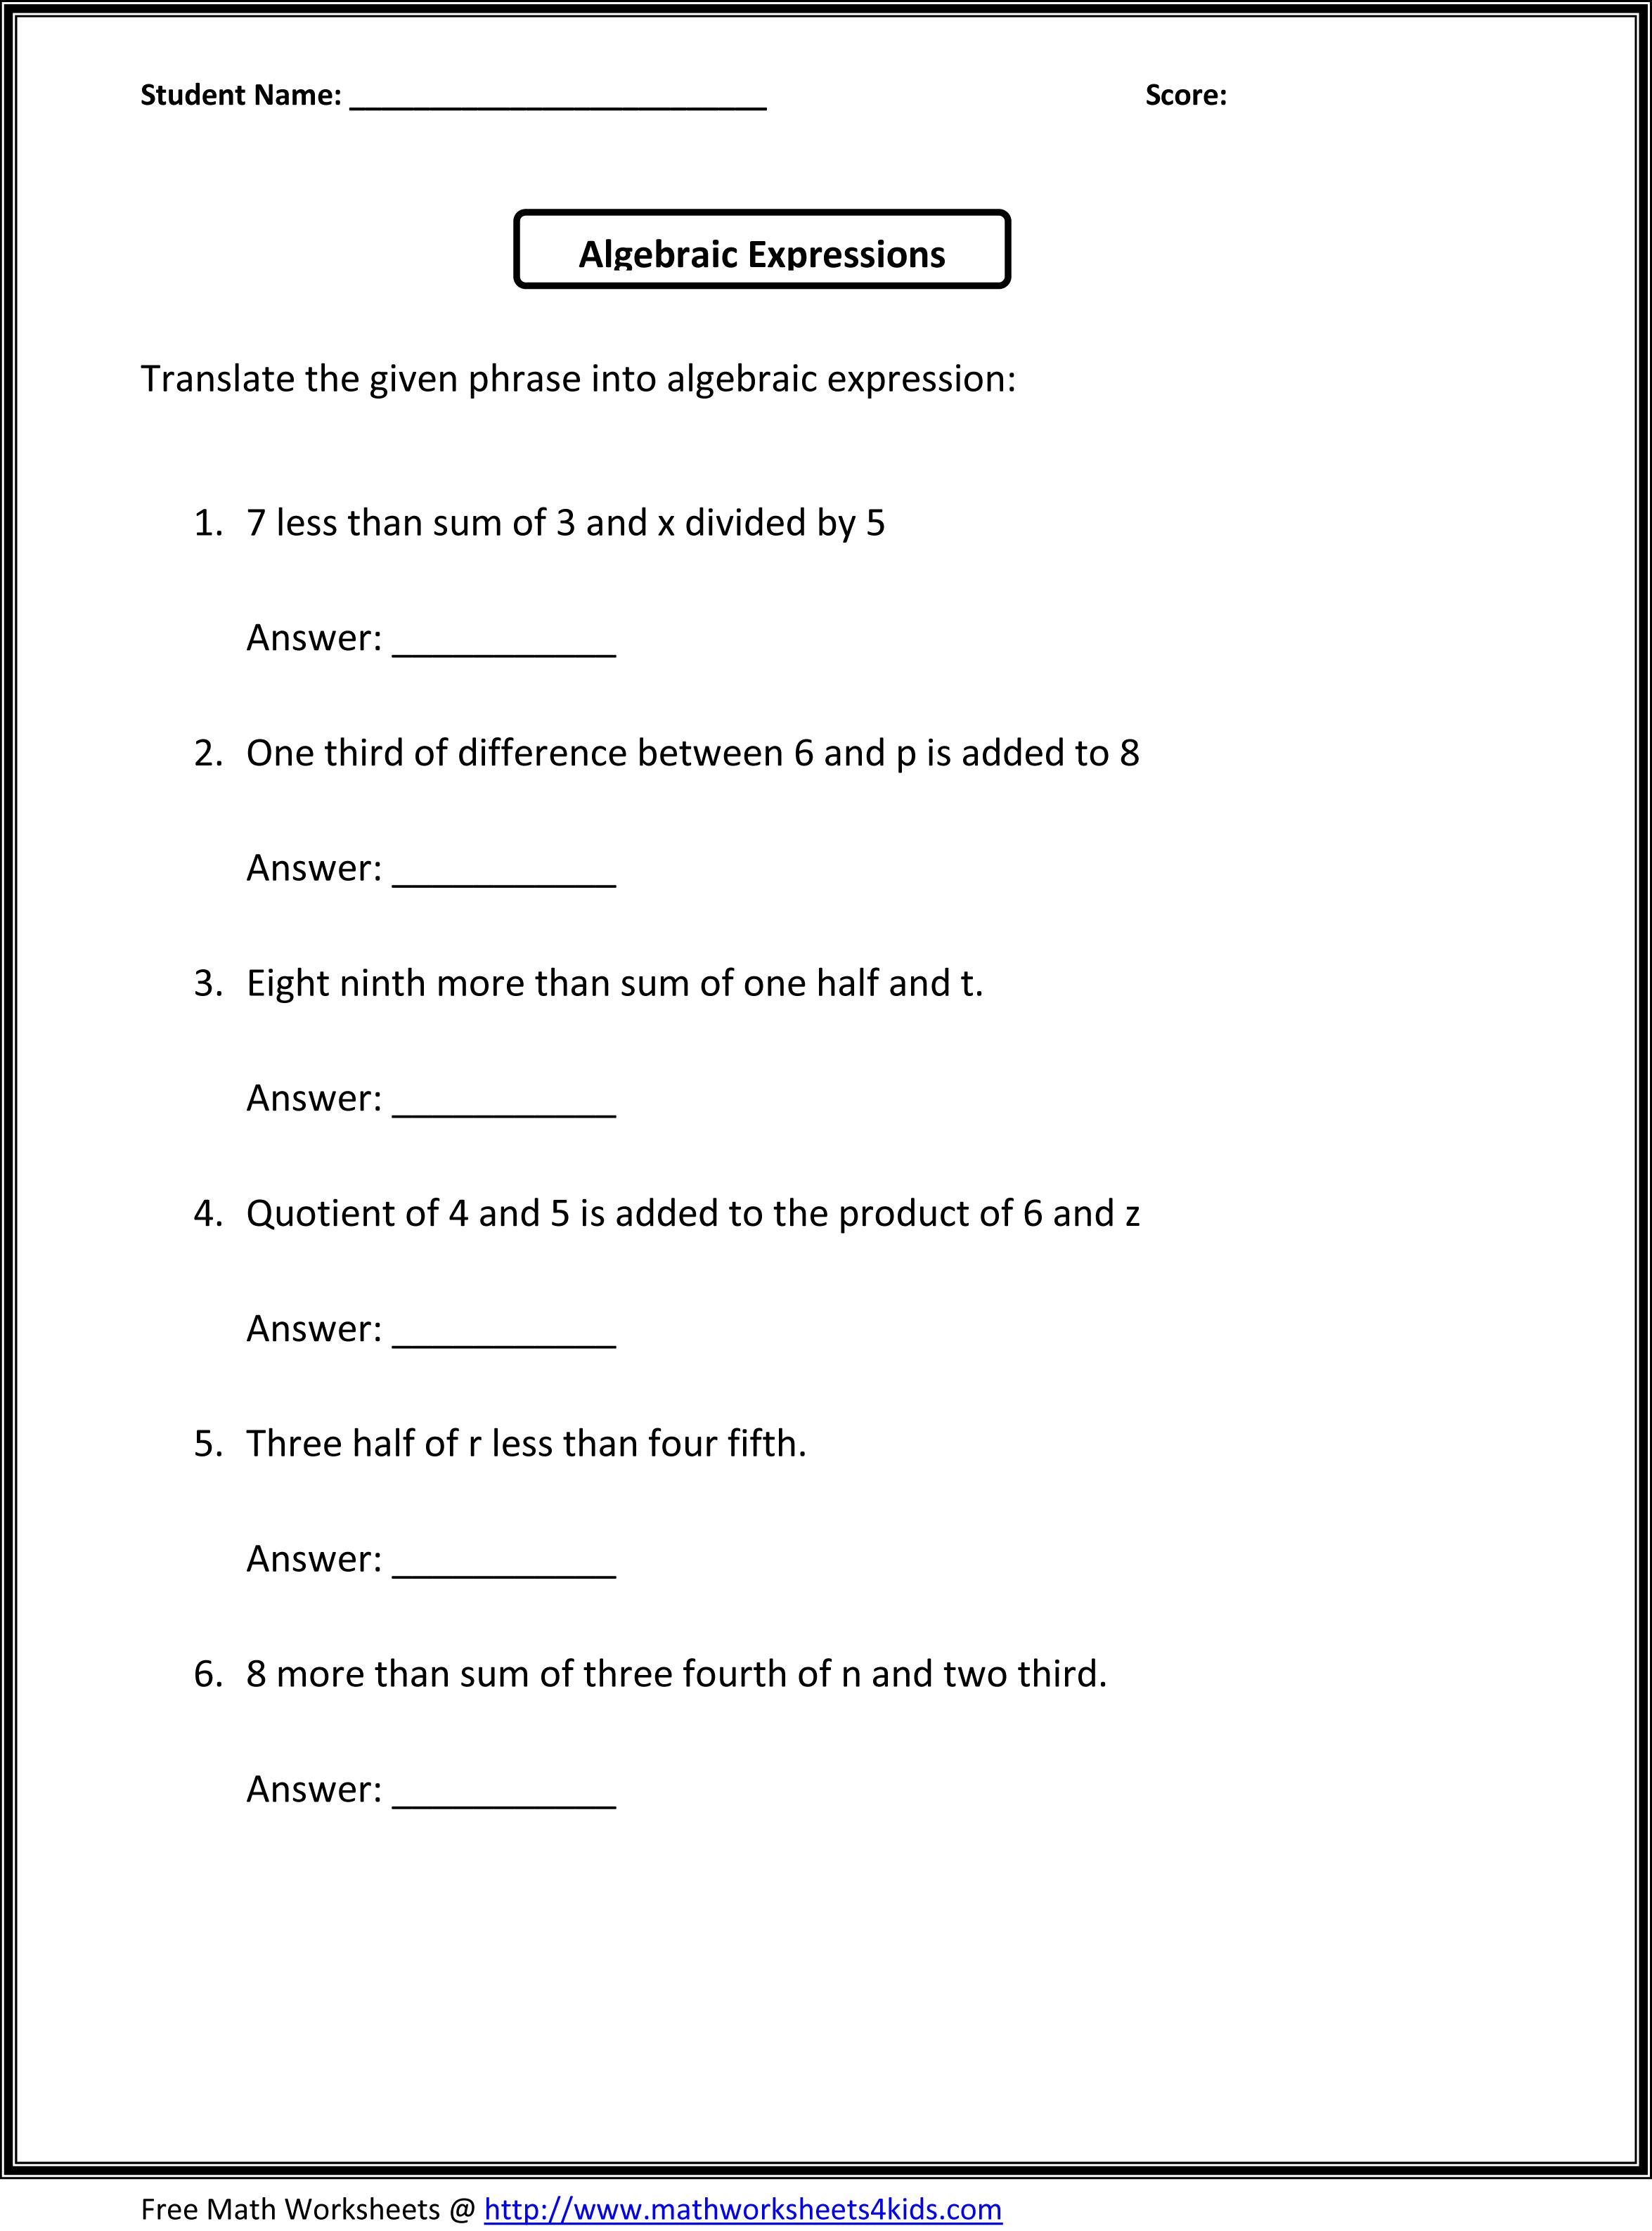 Mental Math Worksheets For 7th Grade Printable Worksheets